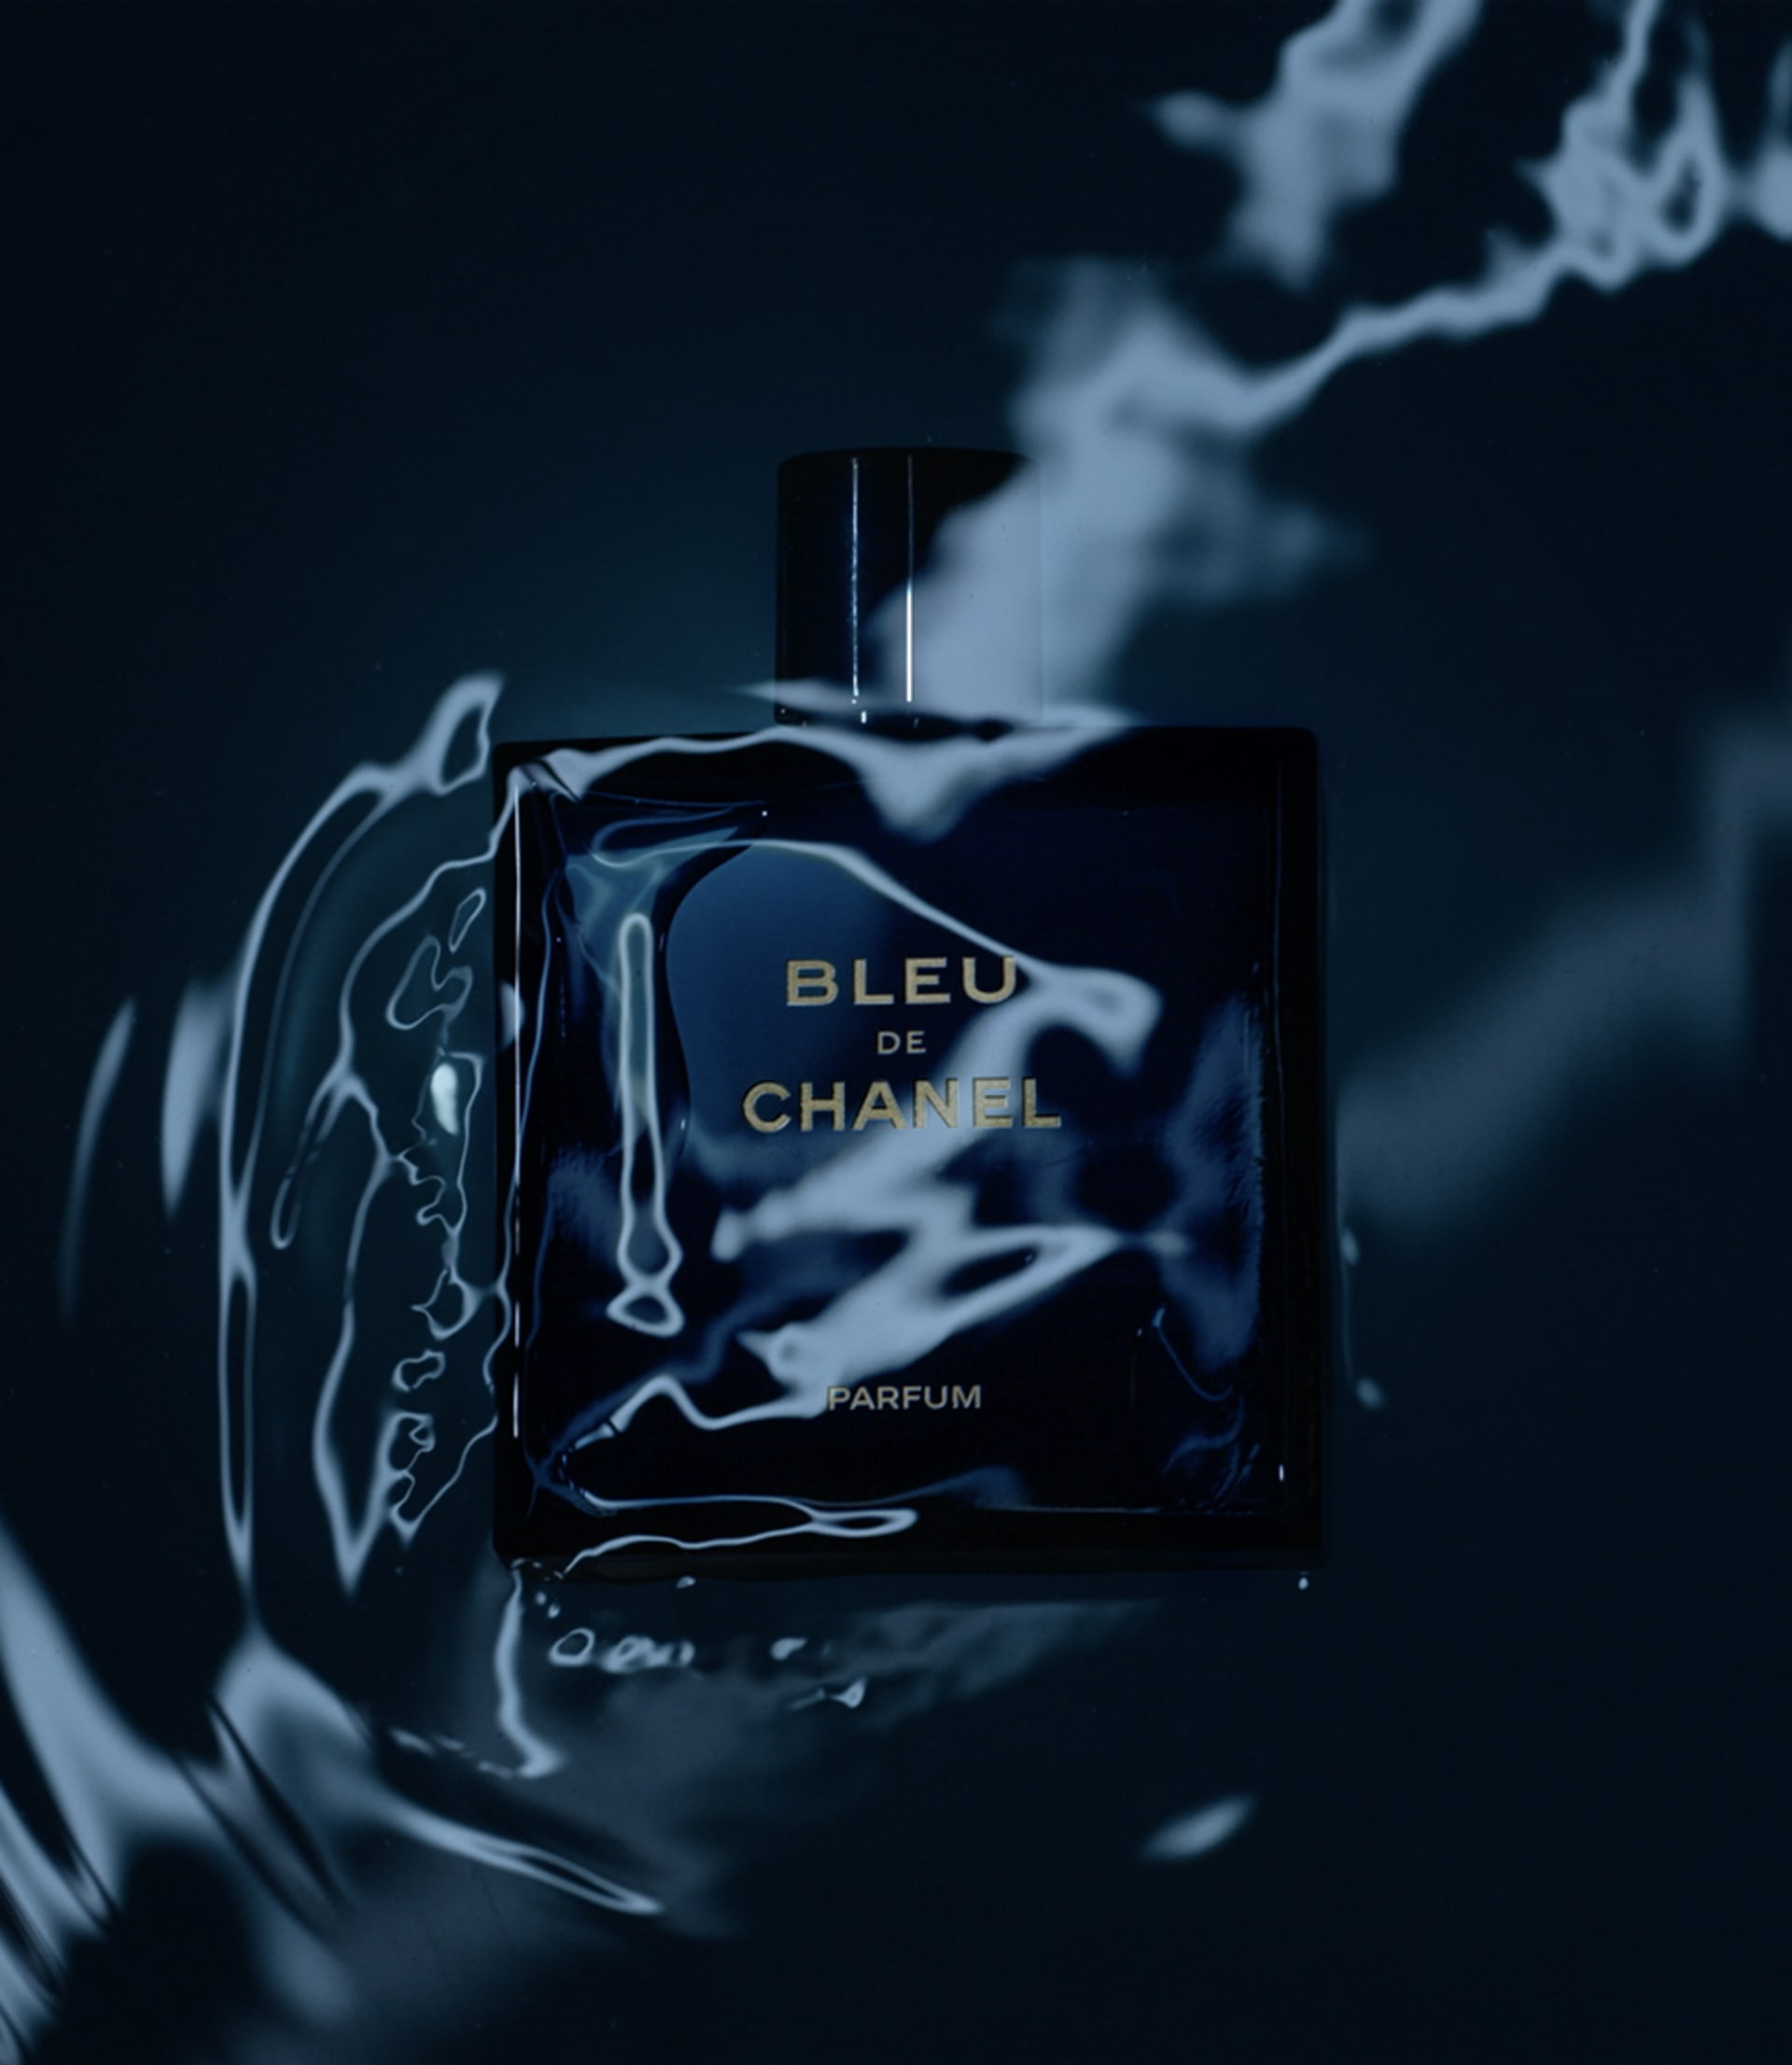 Nước Hoa Nam - Bleu De Chanel (Eau De Parfum) 150ml   Lazada.vn